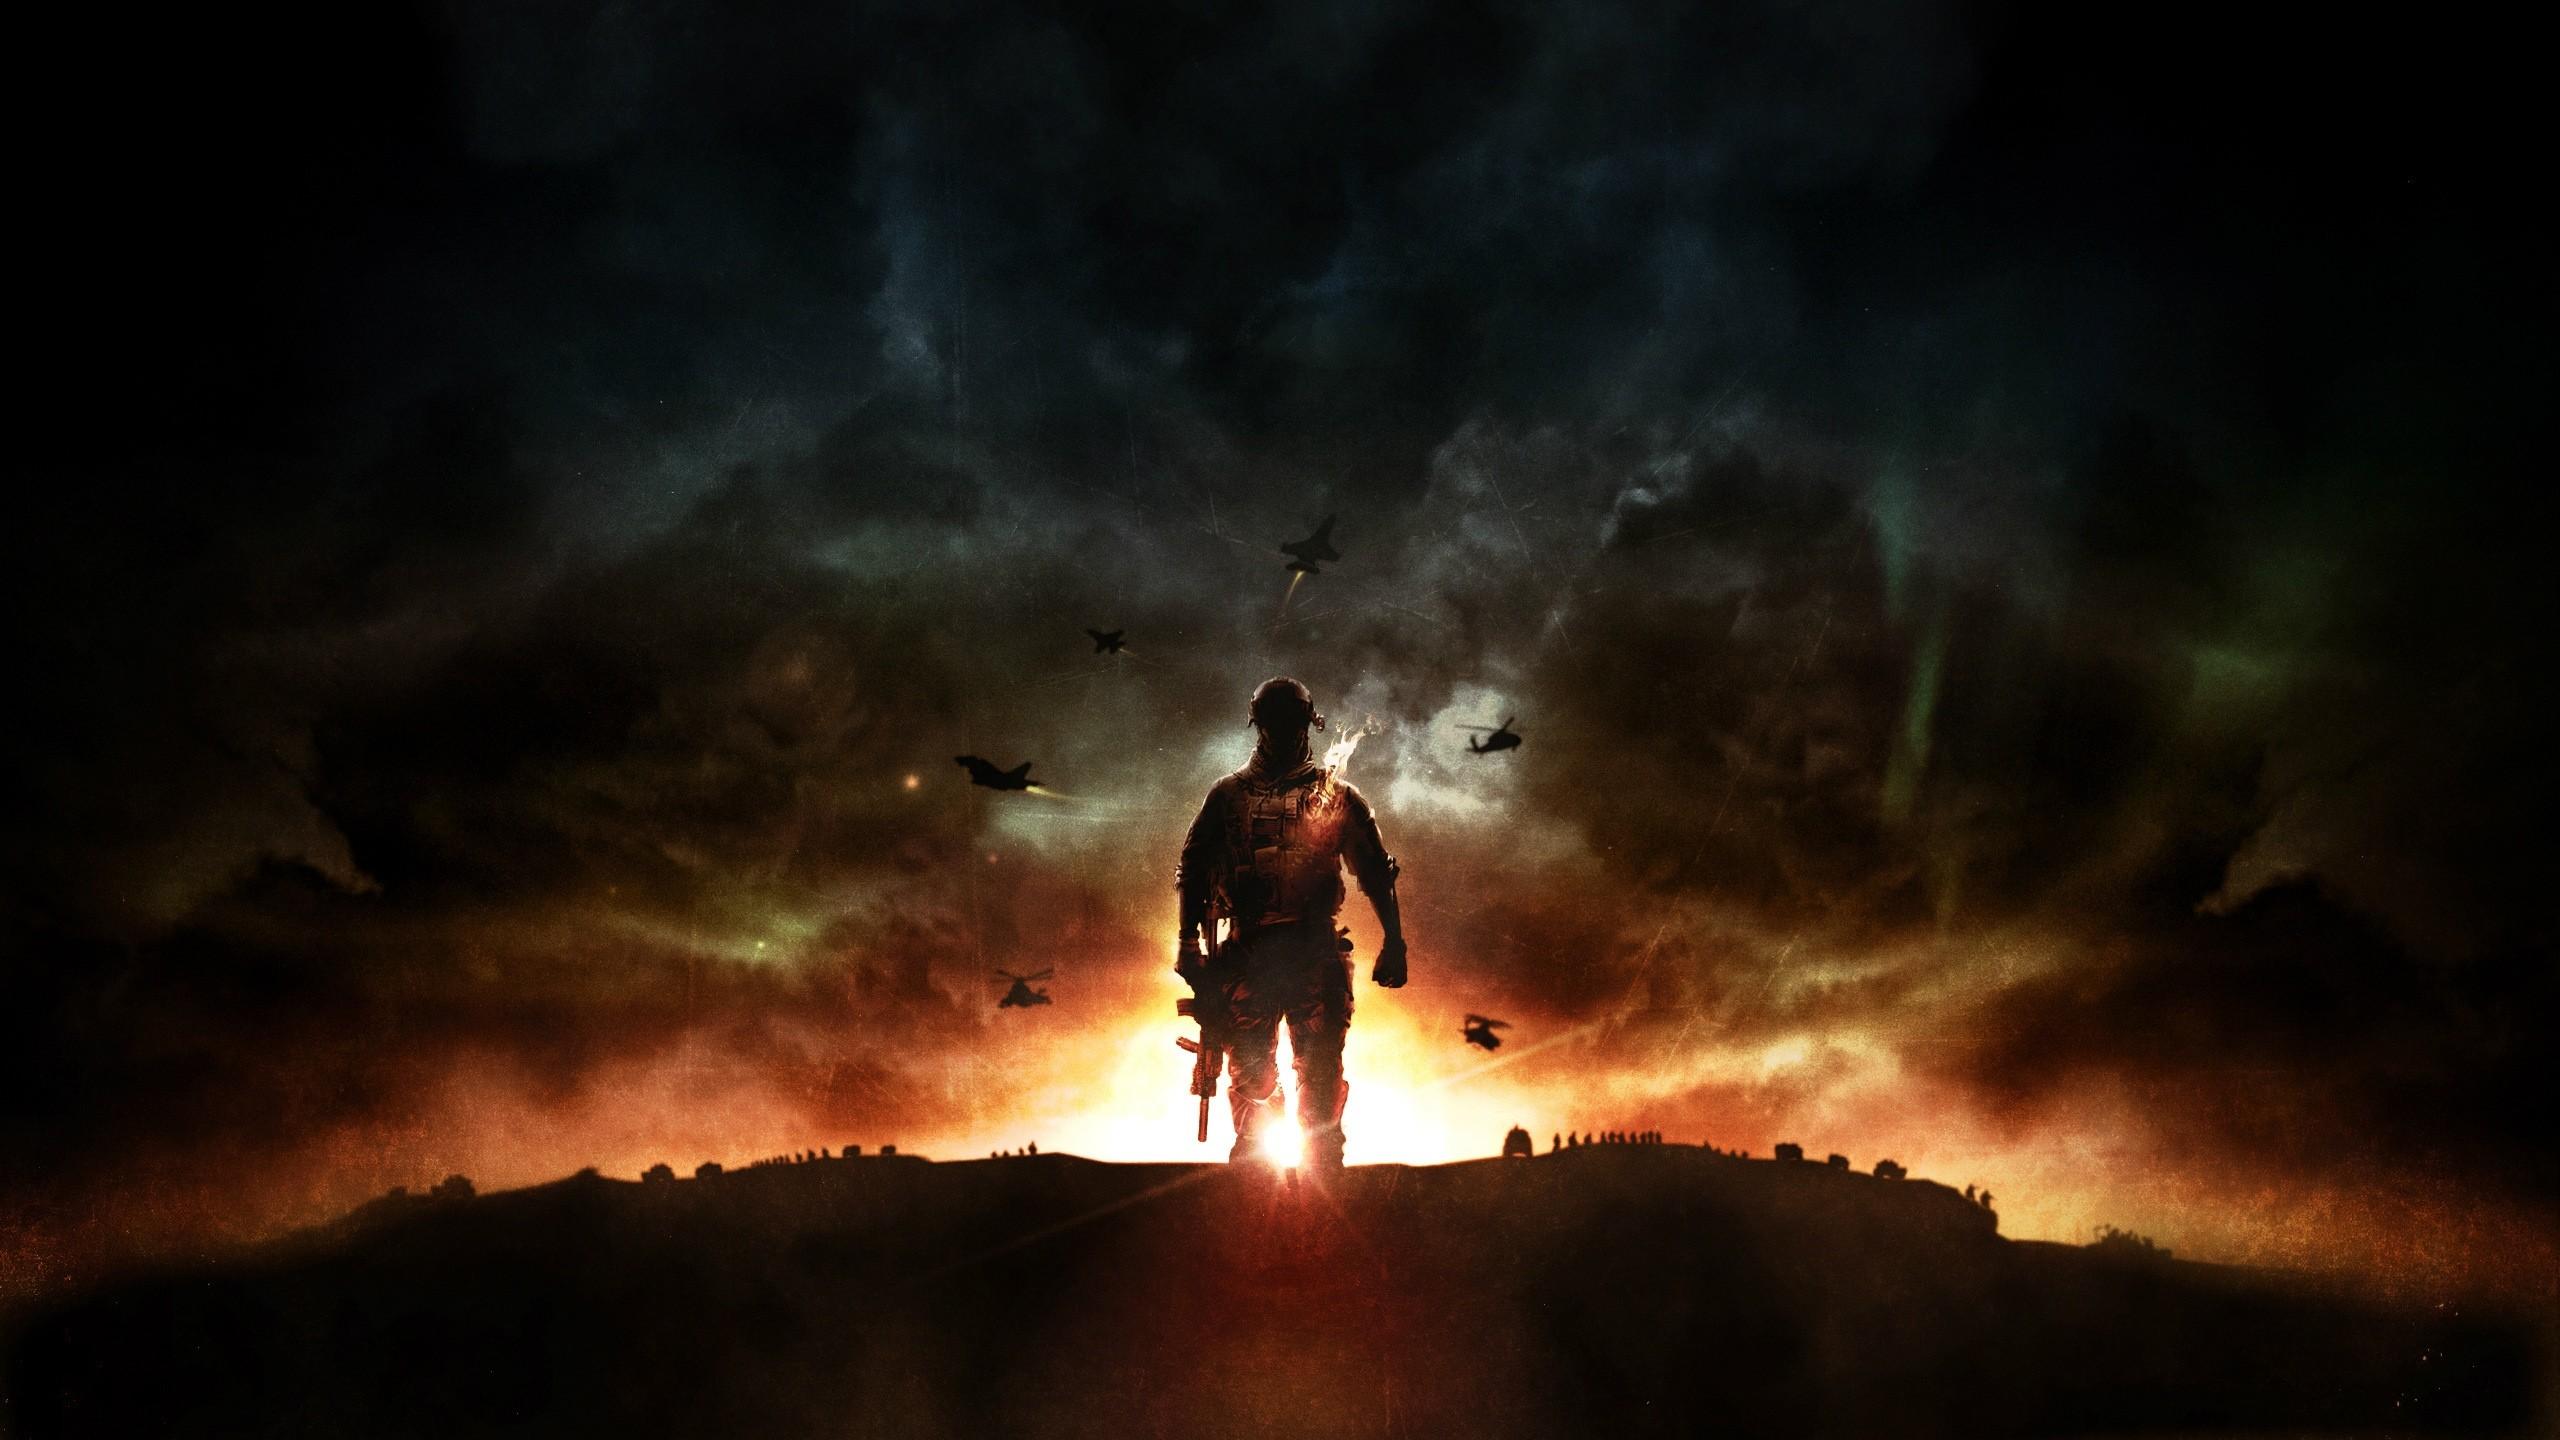 Preview battlefield 4